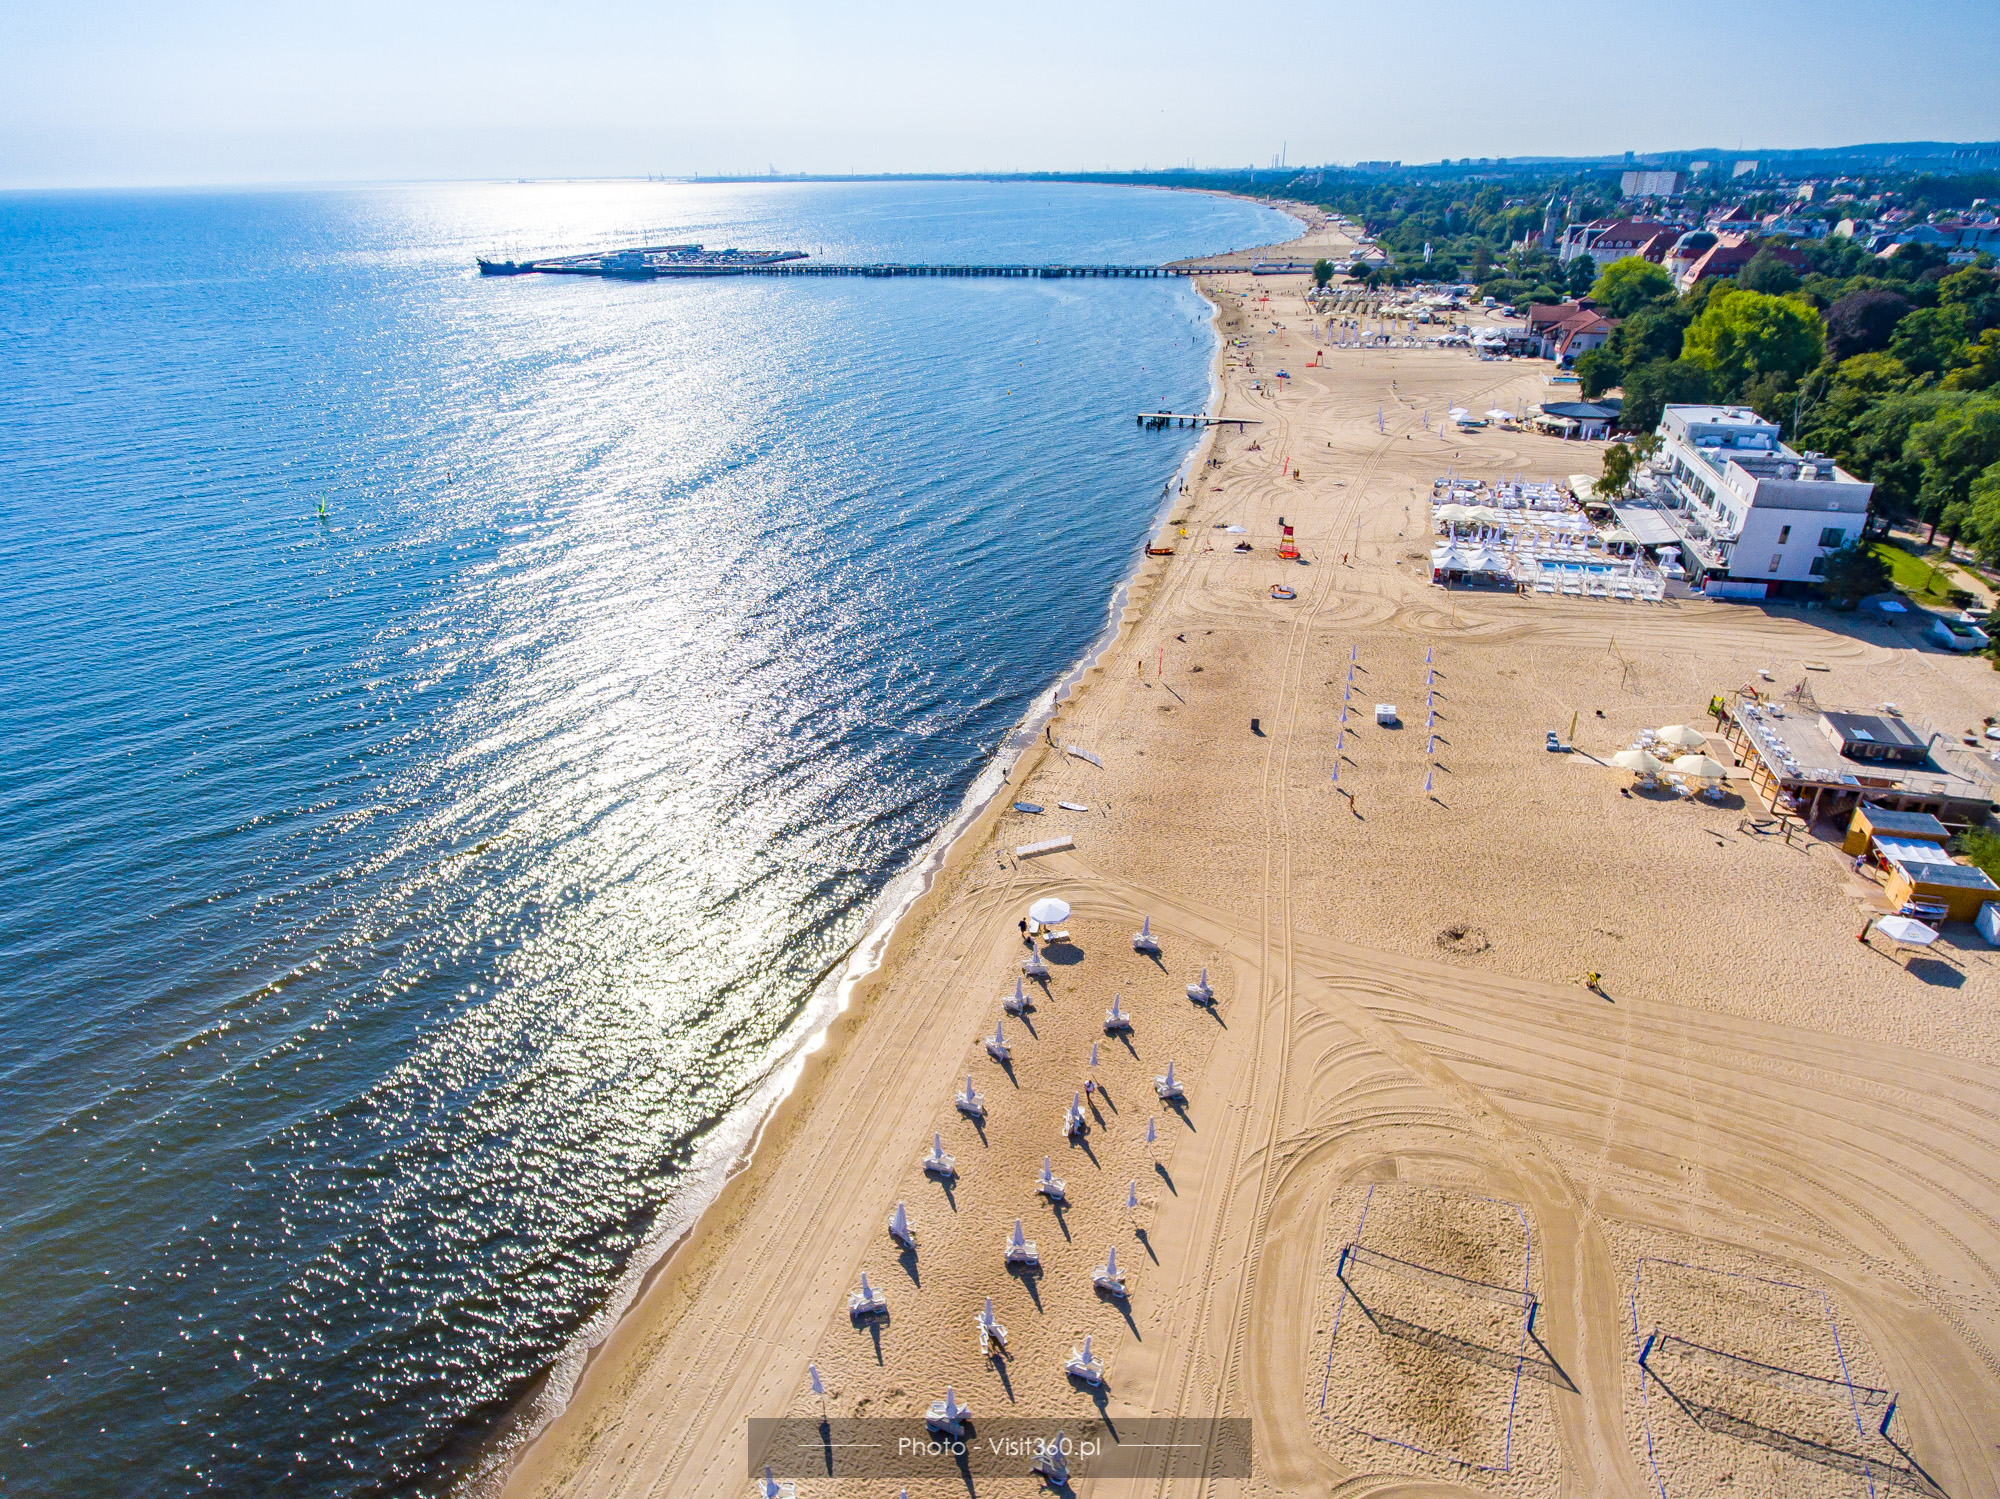 Visit360_pl_Sopot_zdjecia_z_drona_20180817_0027